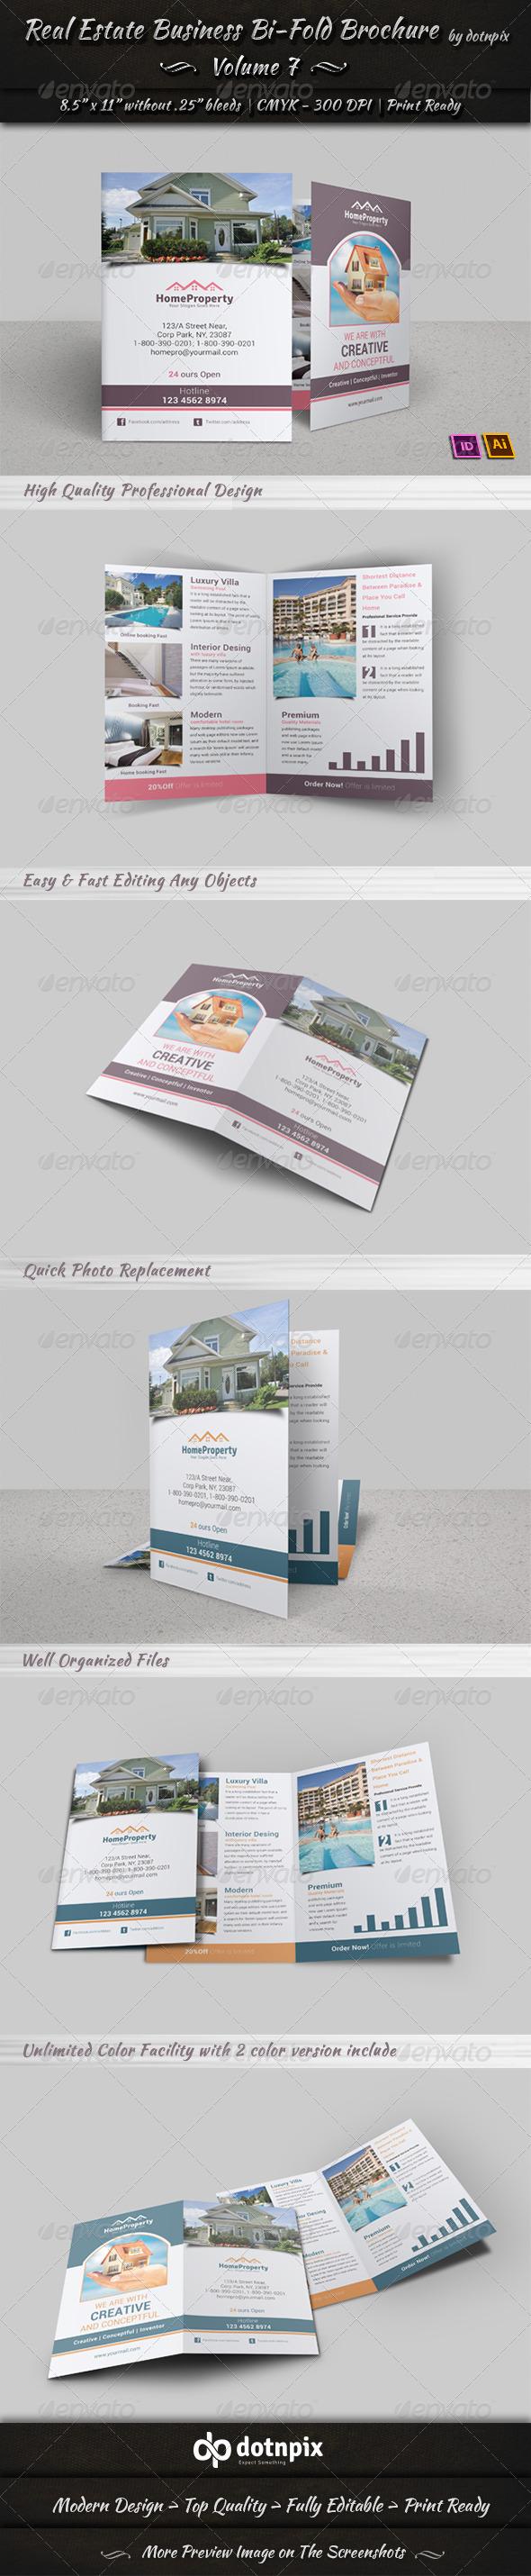 GraphicRiver Real Estate Business Bi-Fold Brochure Volume 7 6577119